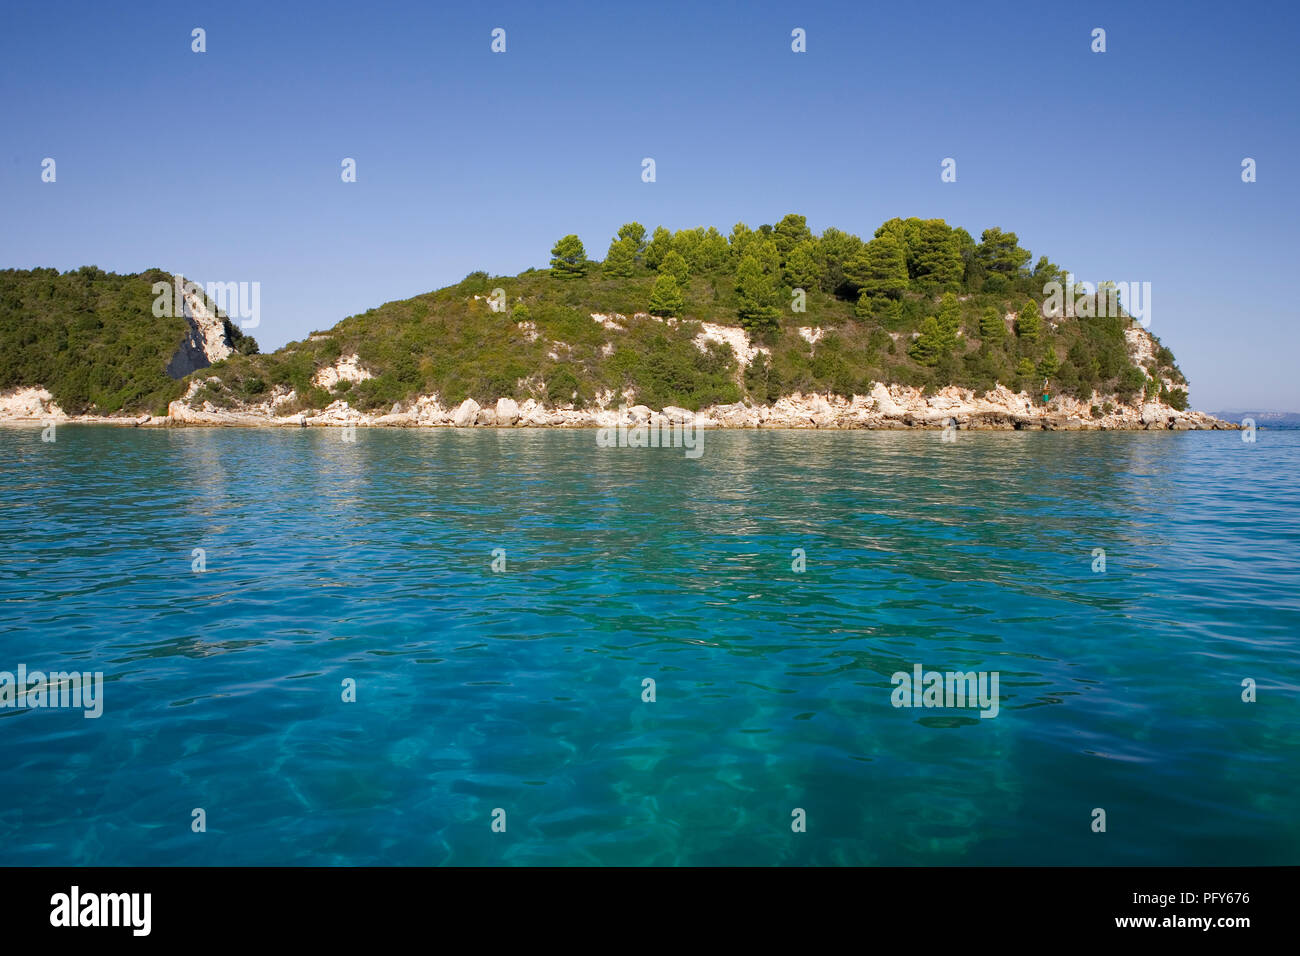 Headland at the entrance to the bay at Lakka, Paxos, Greece - Stock Image